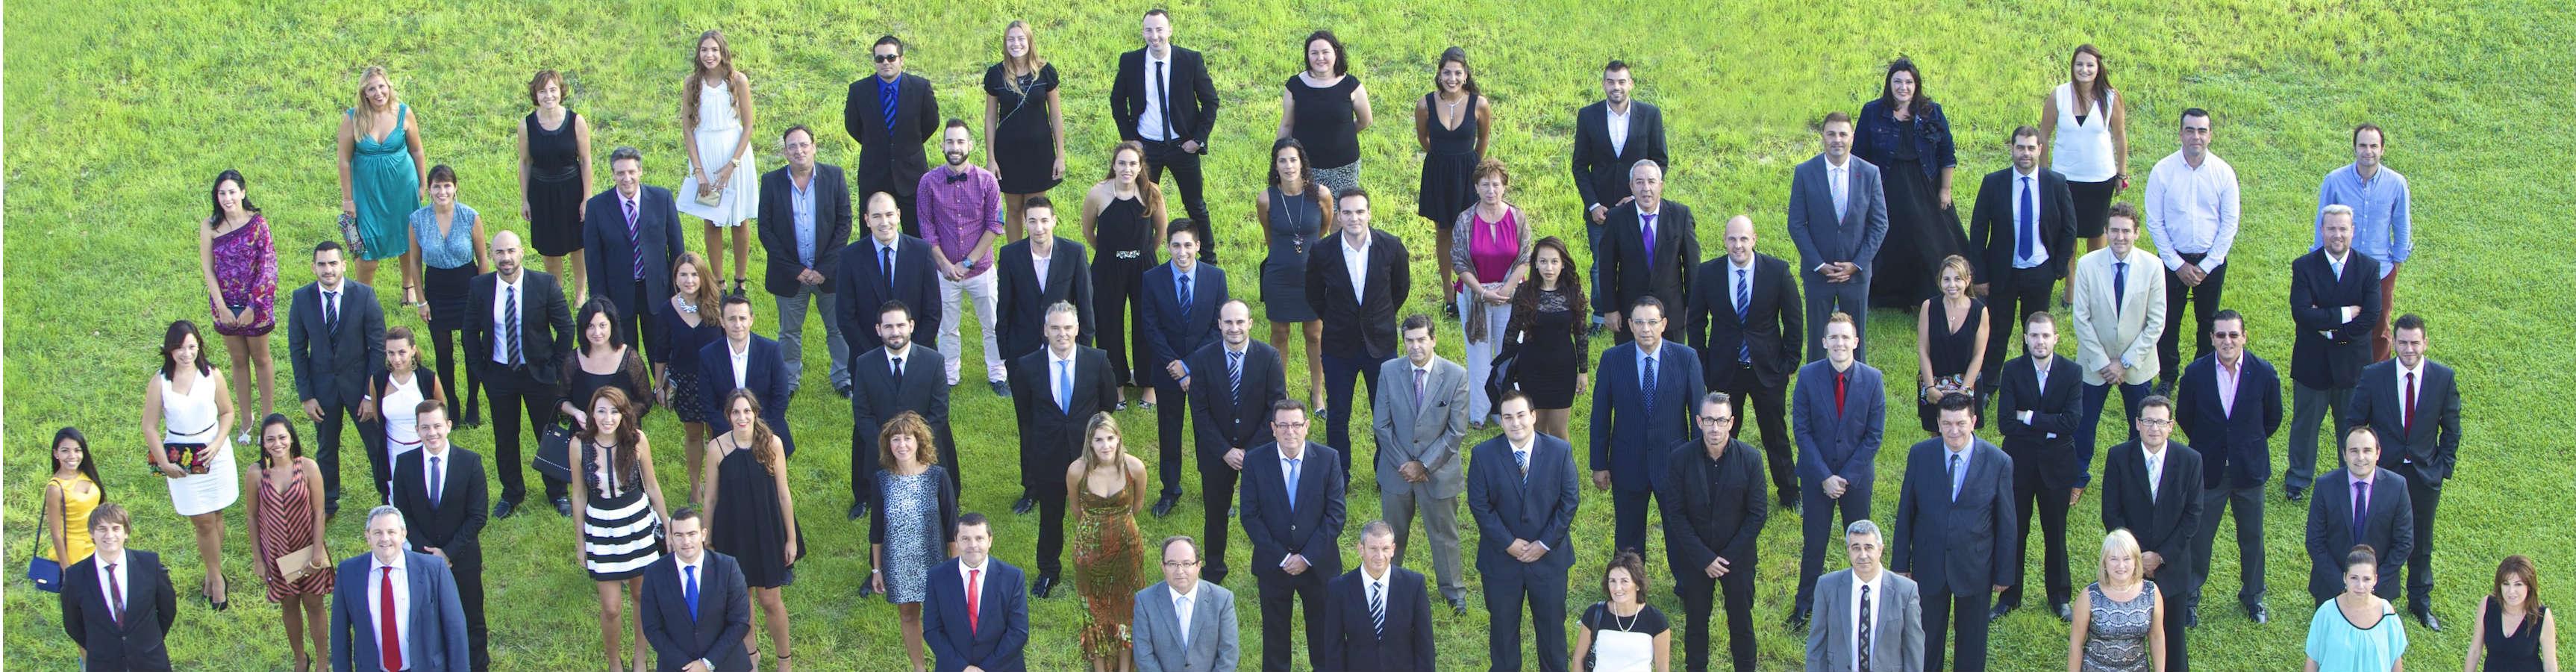 alumnos-postgrado-2013-2014-rrhh-empresas-hosteleria